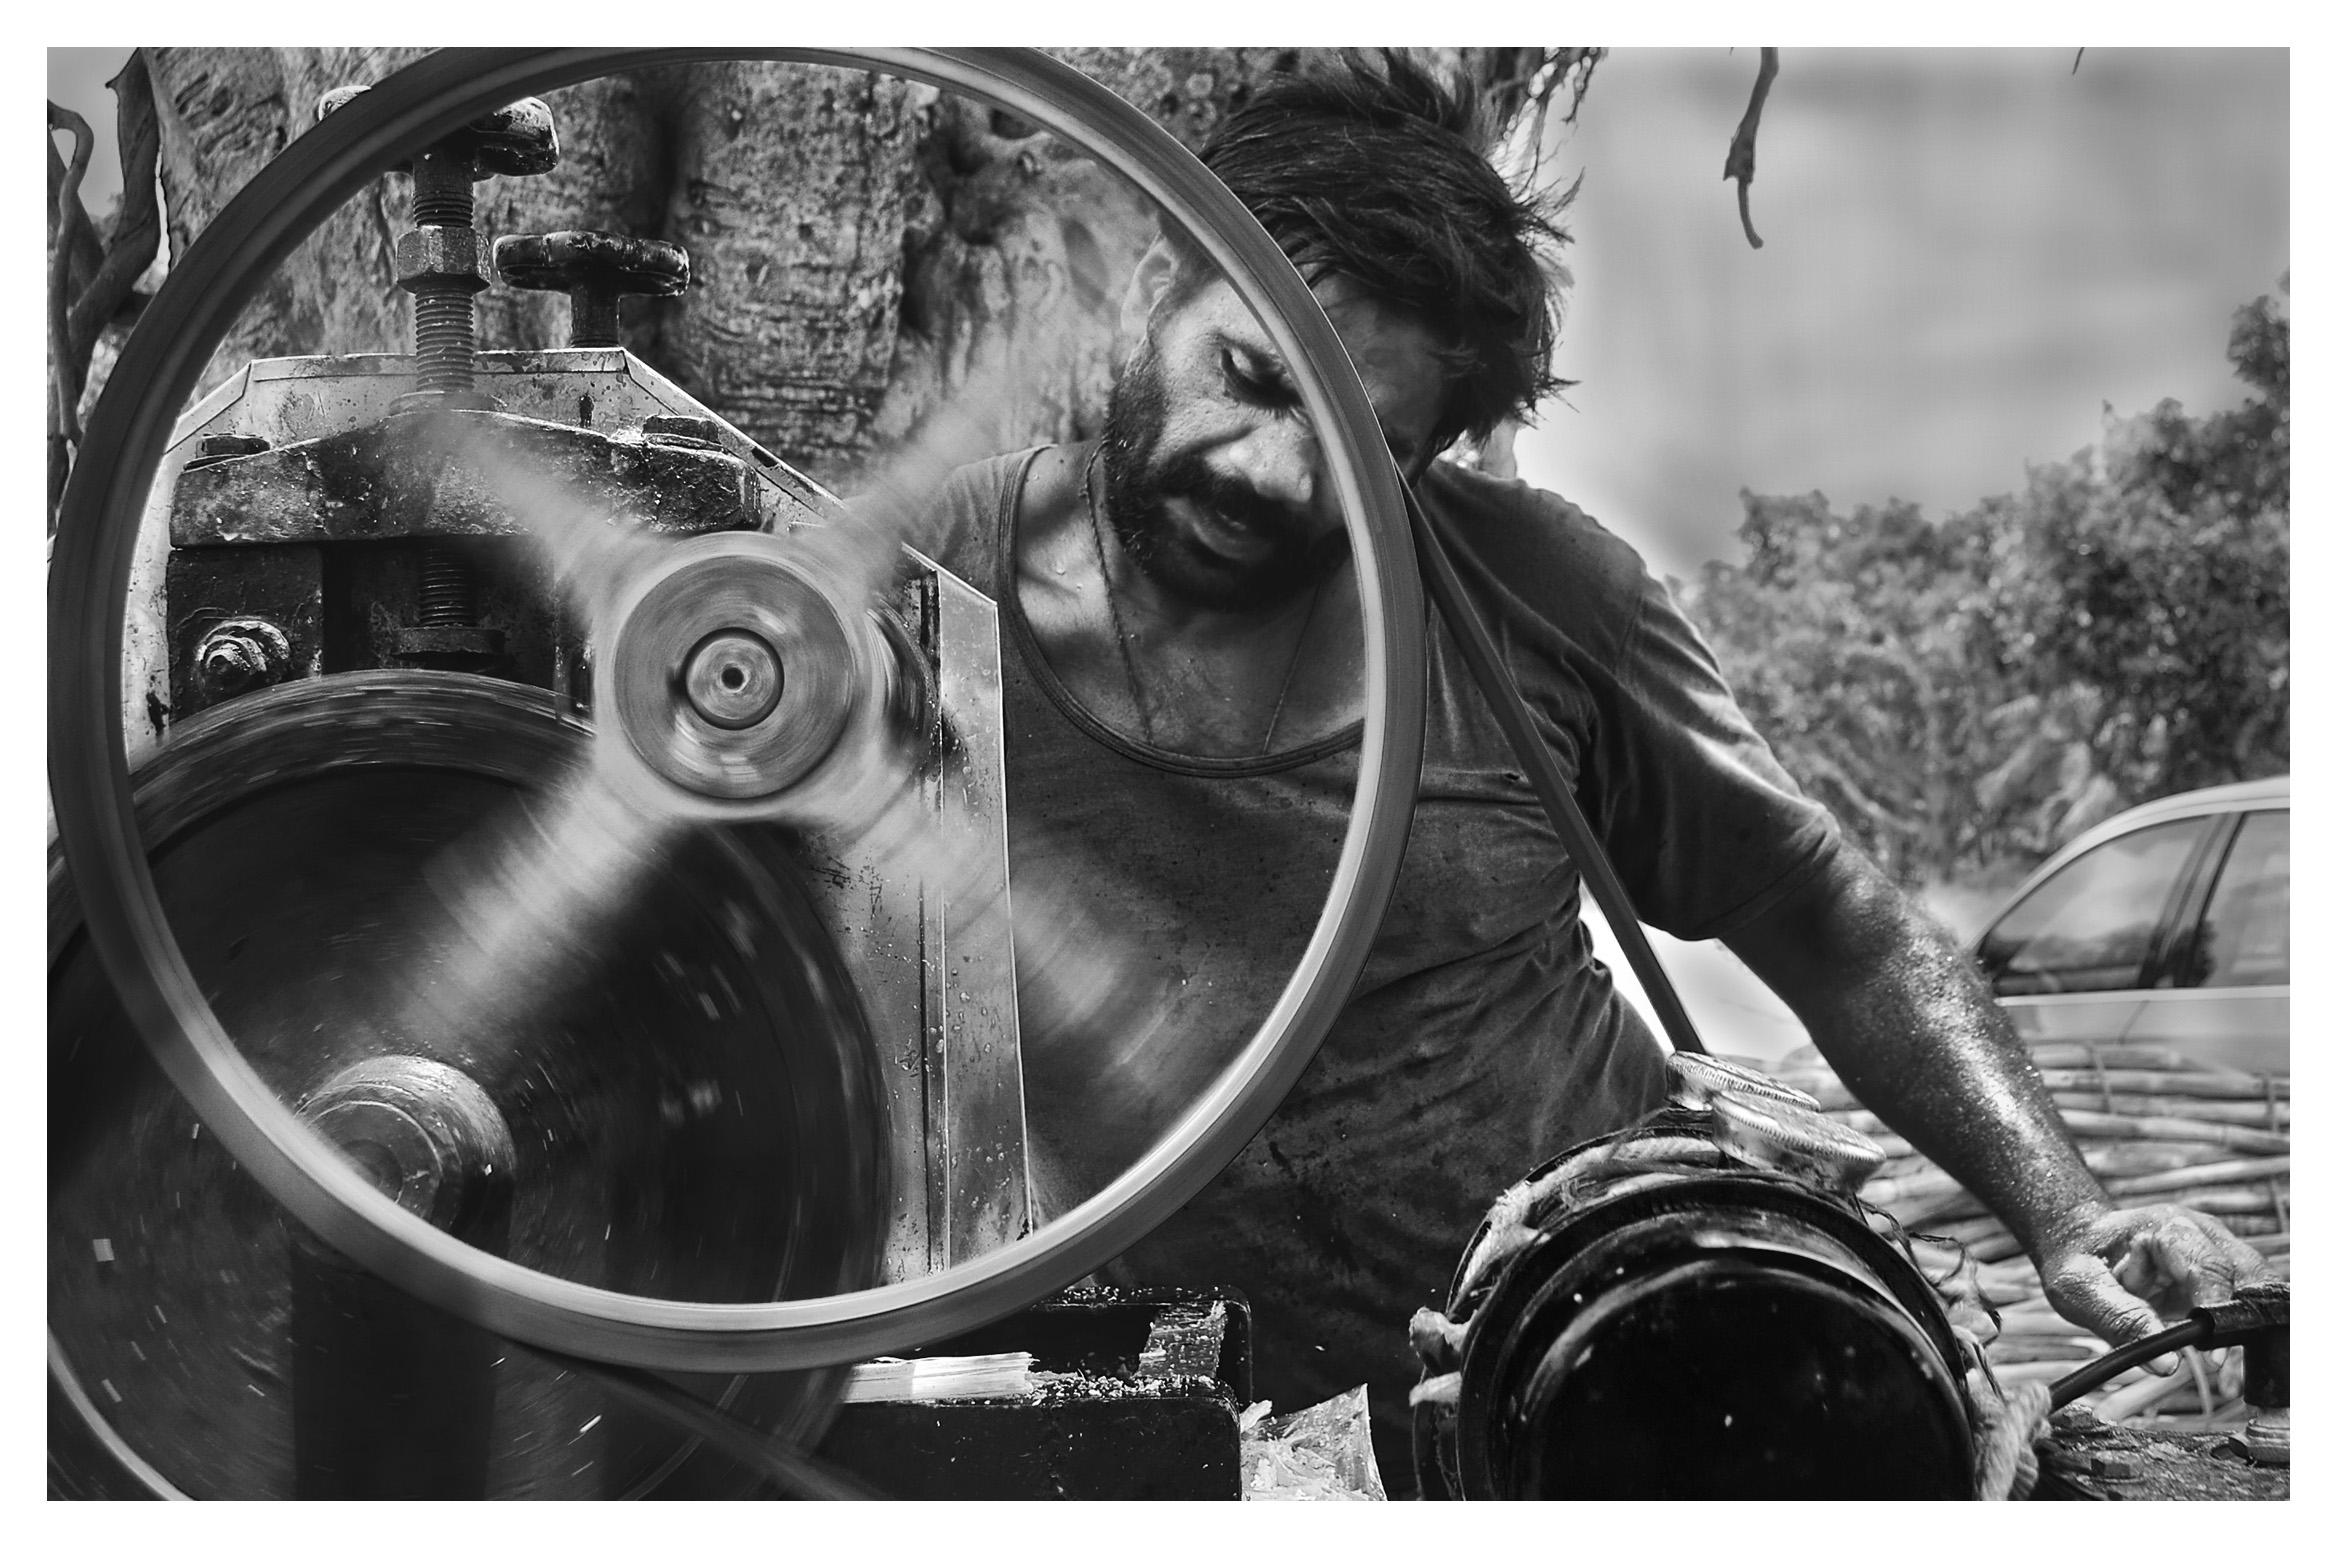 Chakra Varthy : Portrait of juice seller - Mayank Pandey amateur photographer from Mumbai India online photo exhibition street [hotography black and white Маянк Пандей фотограф любитель из Мумбай Индия онлайн фотовыставка стрит фотография черно белый